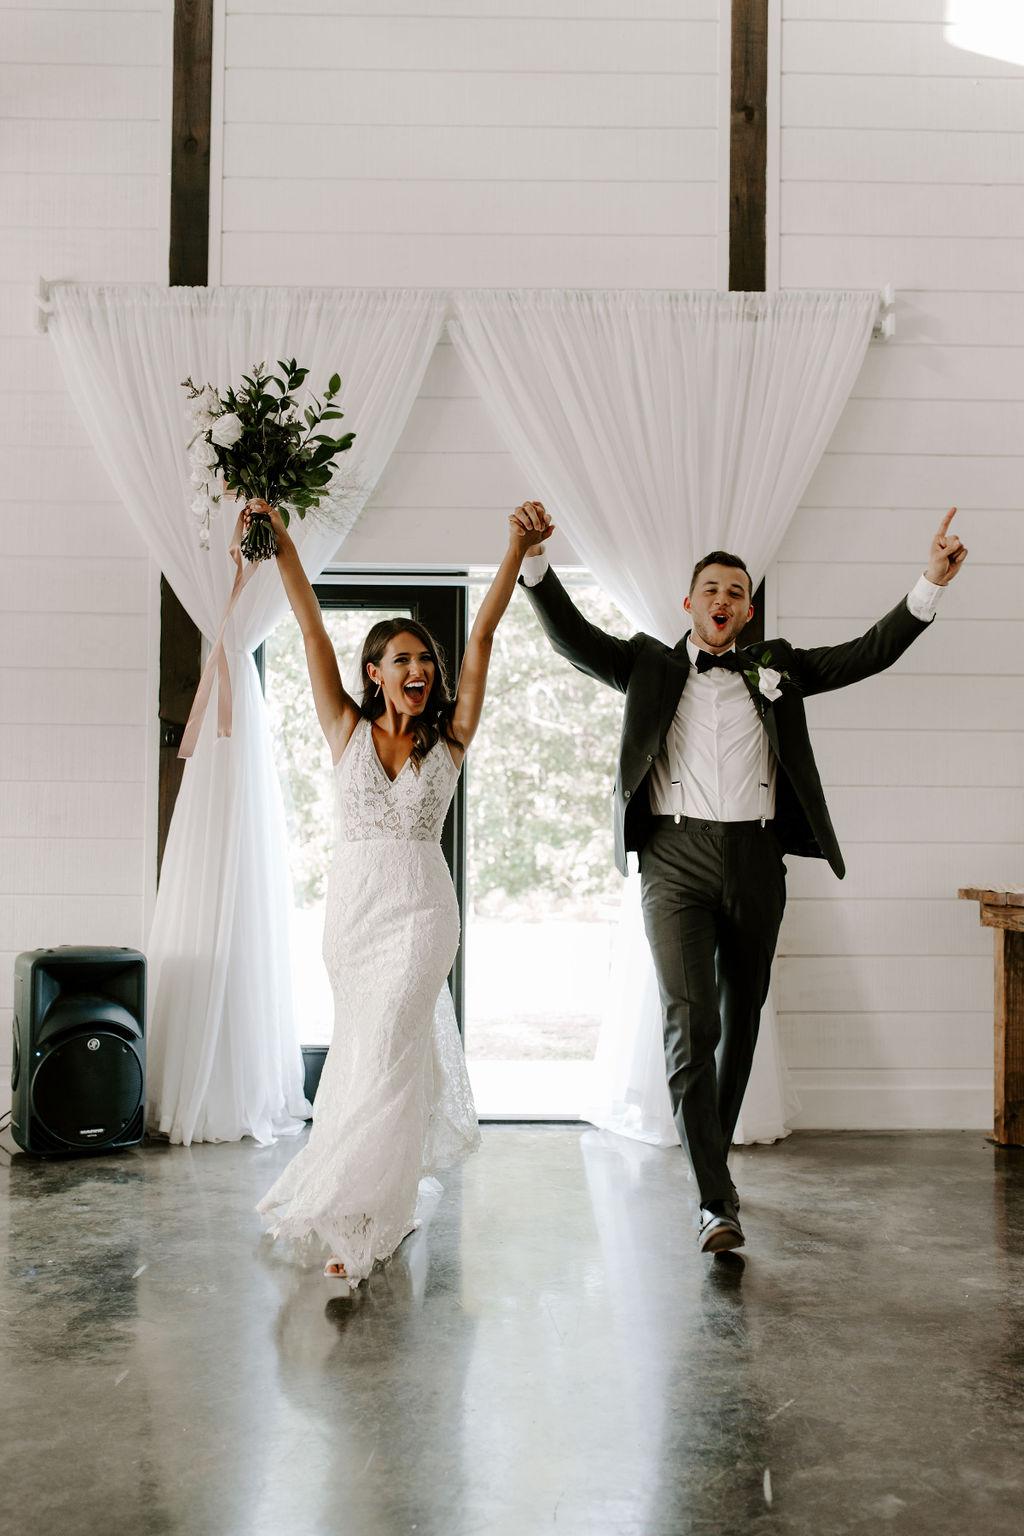 Tulsa White Barn Wedding Venue Outdoor Ceremony 99.jpg